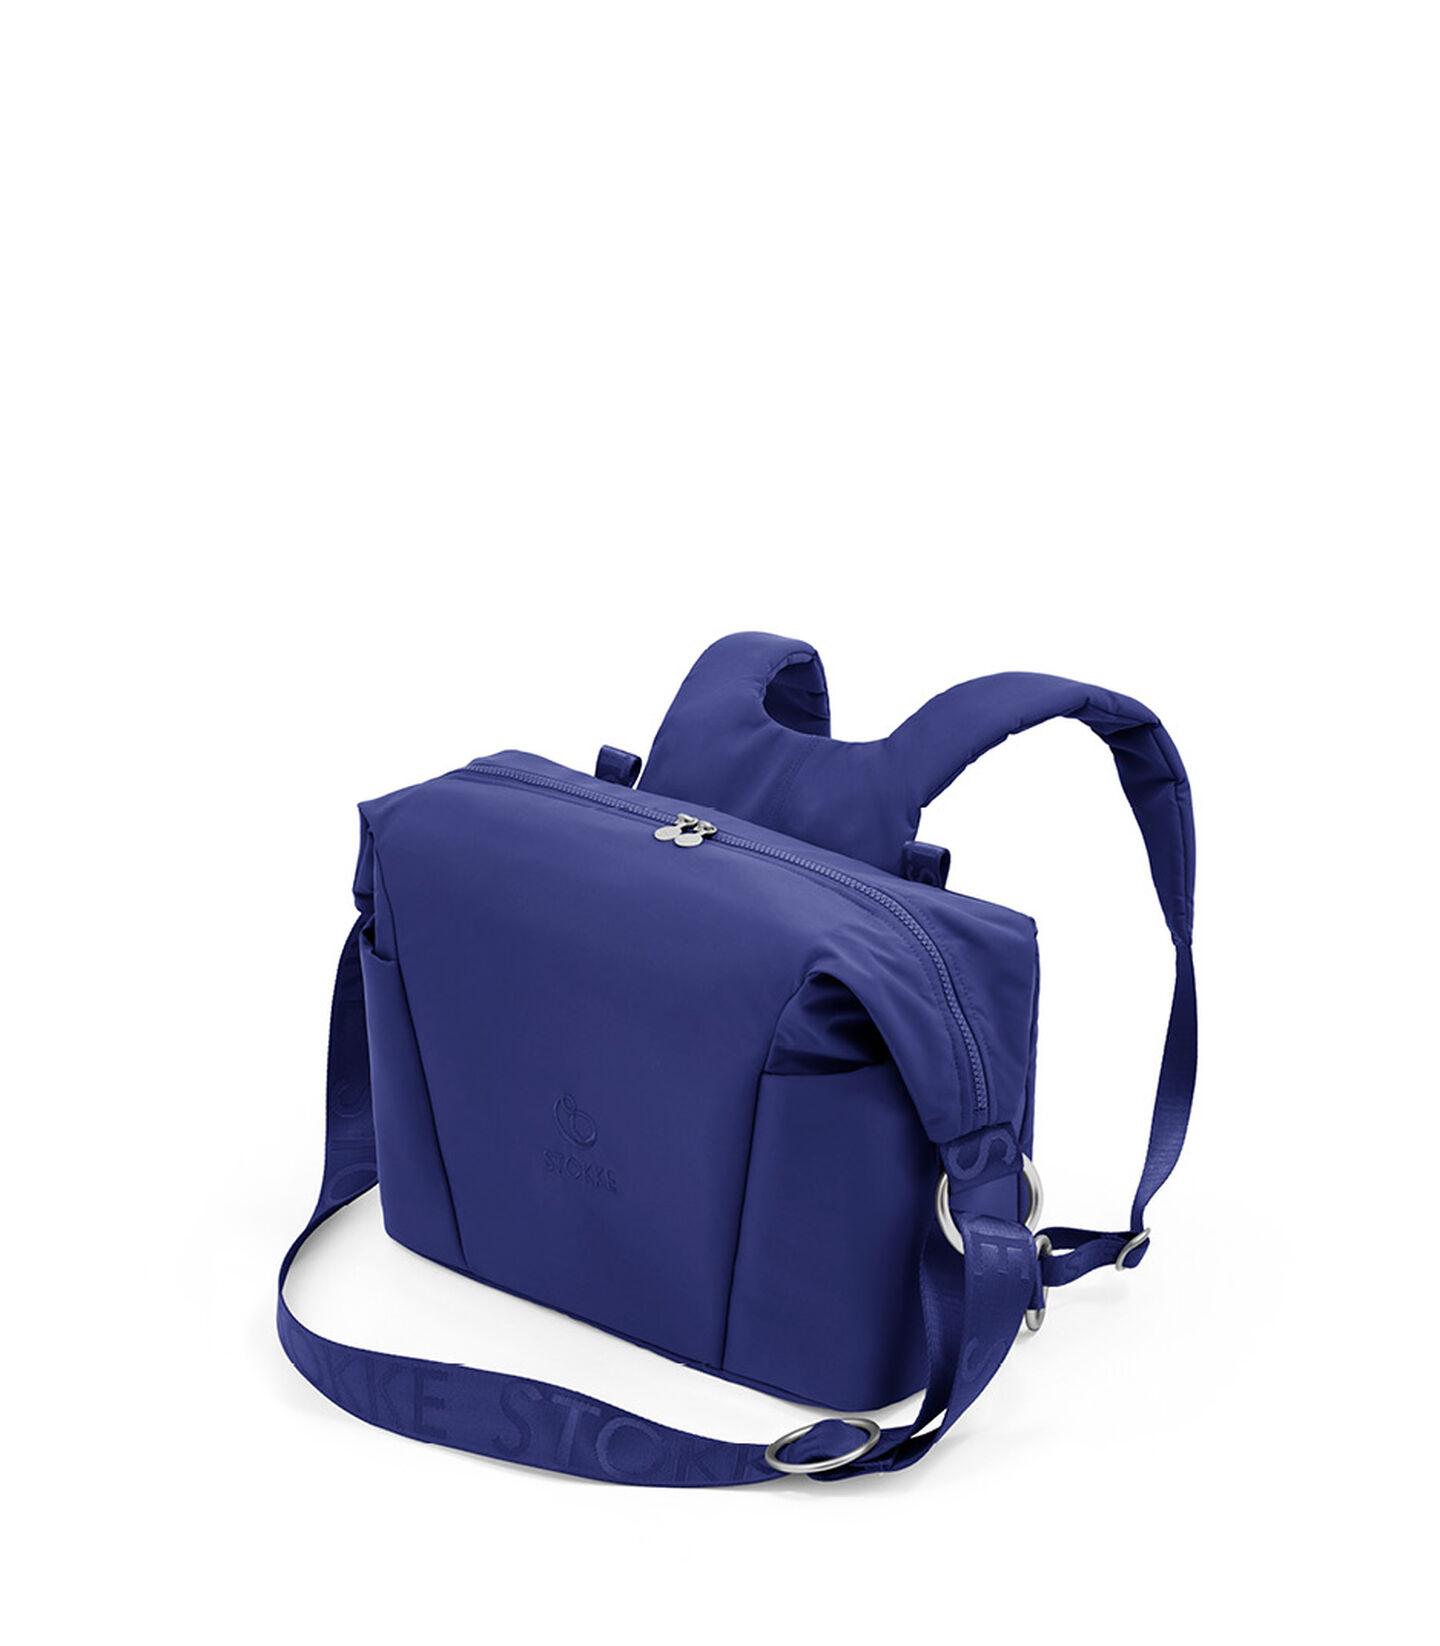 Stokke® Xplory® X Changing bag Royal Blue, Royal Blue, mainview view 2